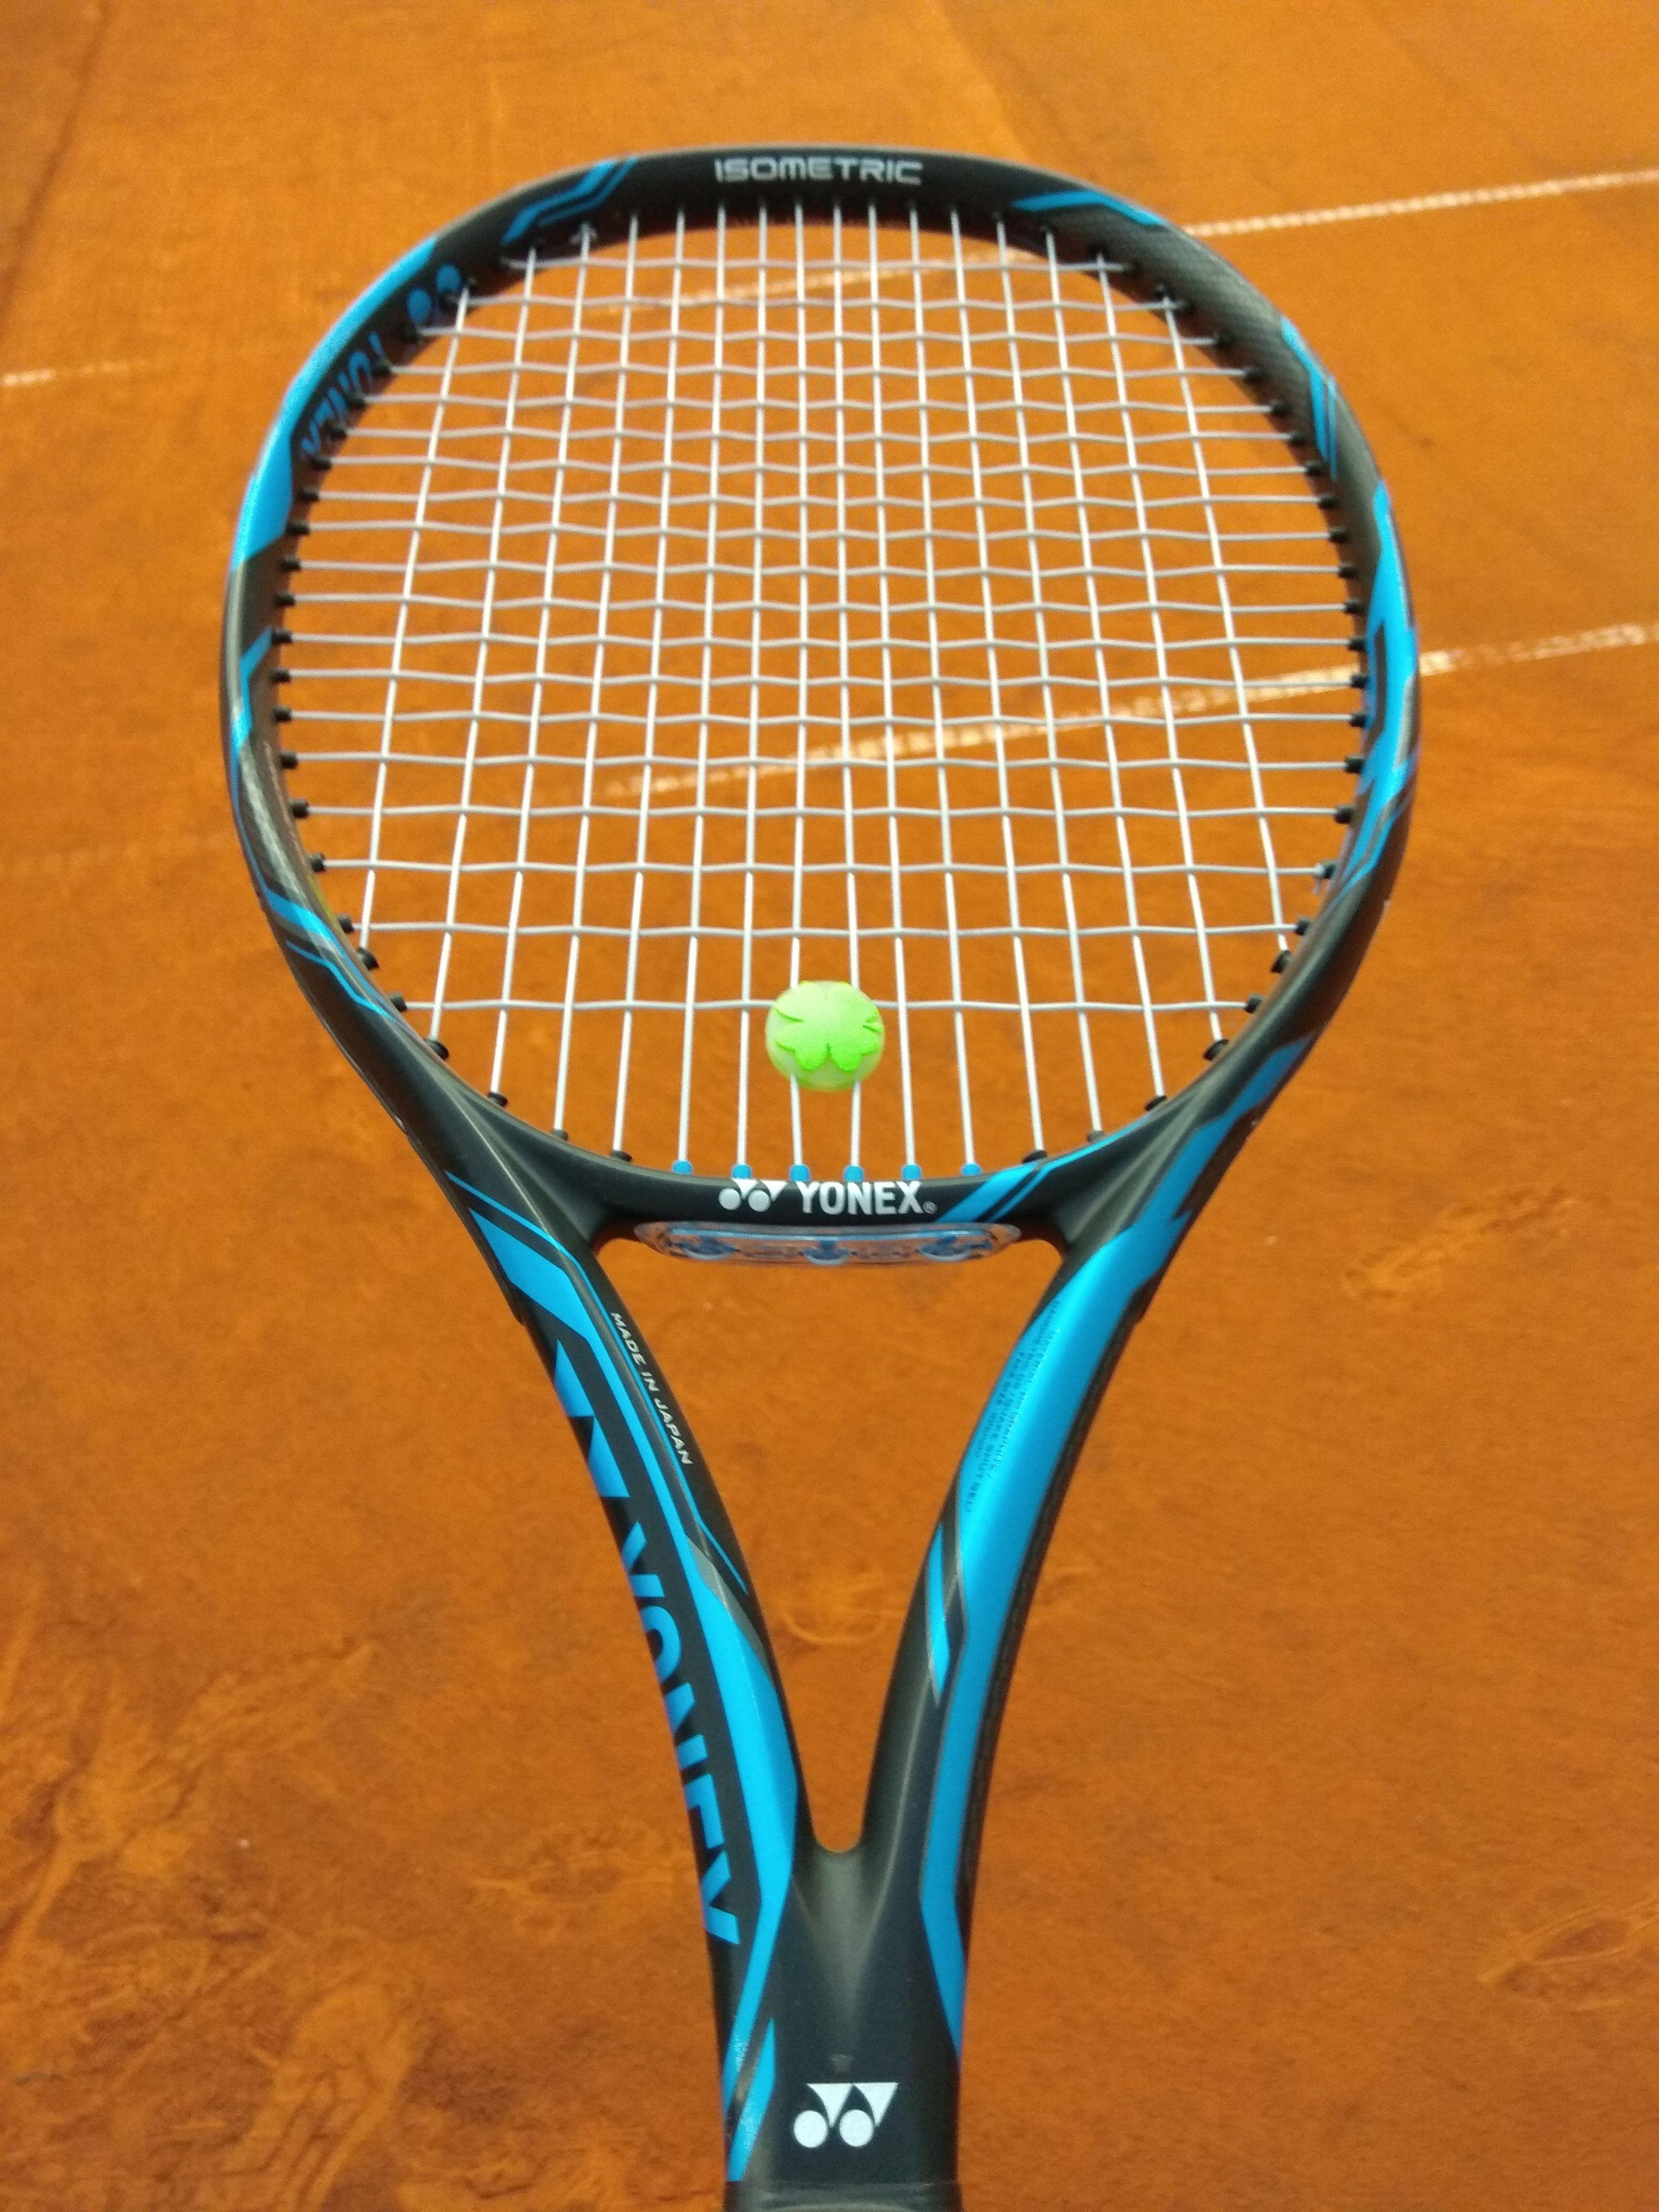 Yonex Ezone Dr100 Tennis Racket Rackets Yonex